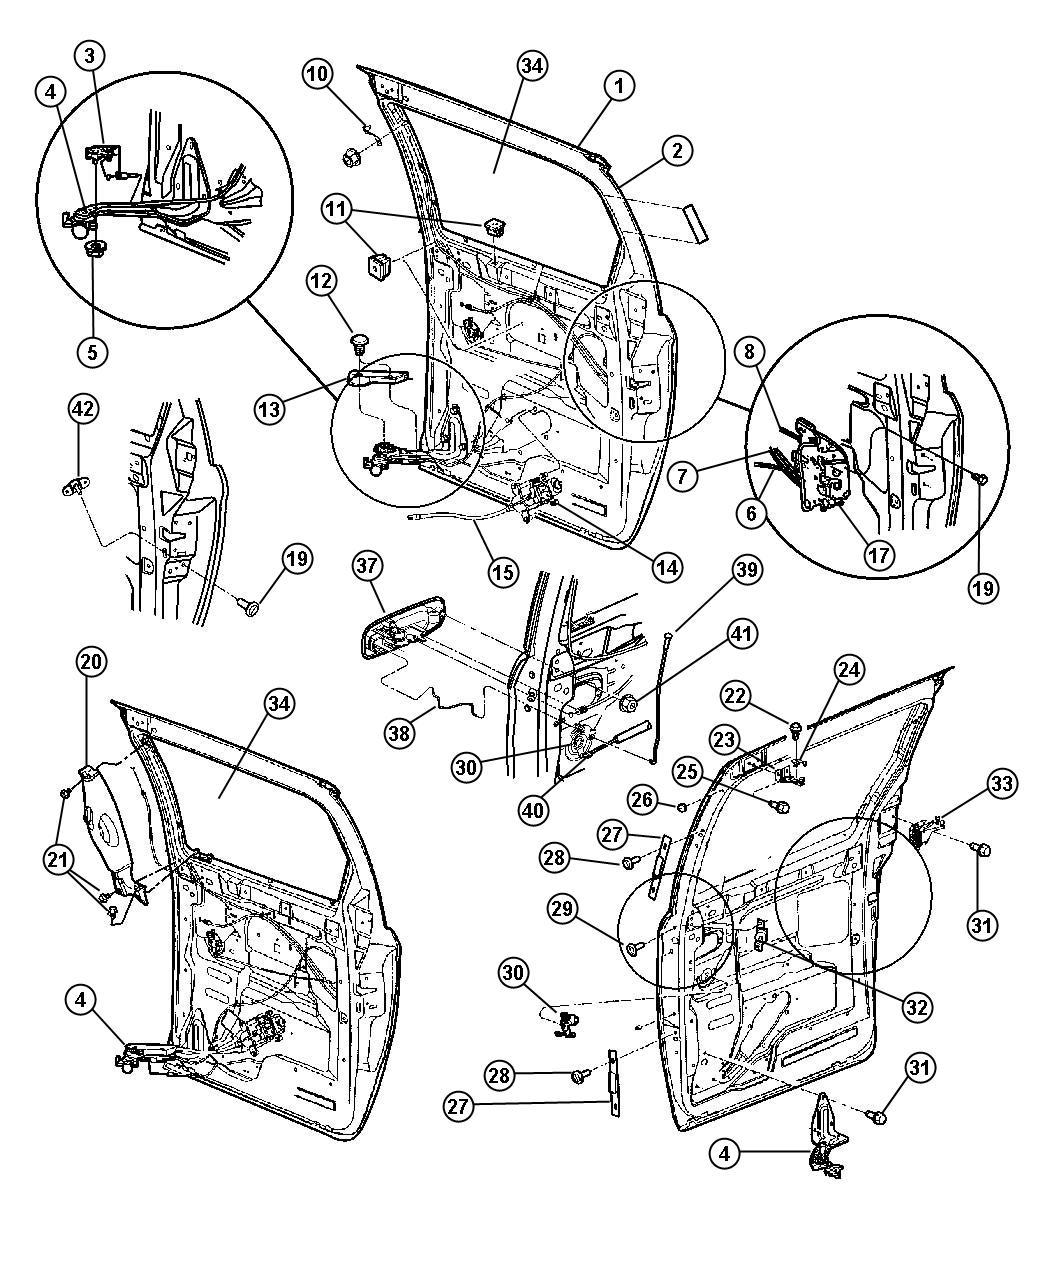 wiring diagram database  tags: #chrysler grand voyager#2001 chrysler voyager  exhaust#1998 chrysler voyager dark purple#2001 chrysler 300m interior#2001